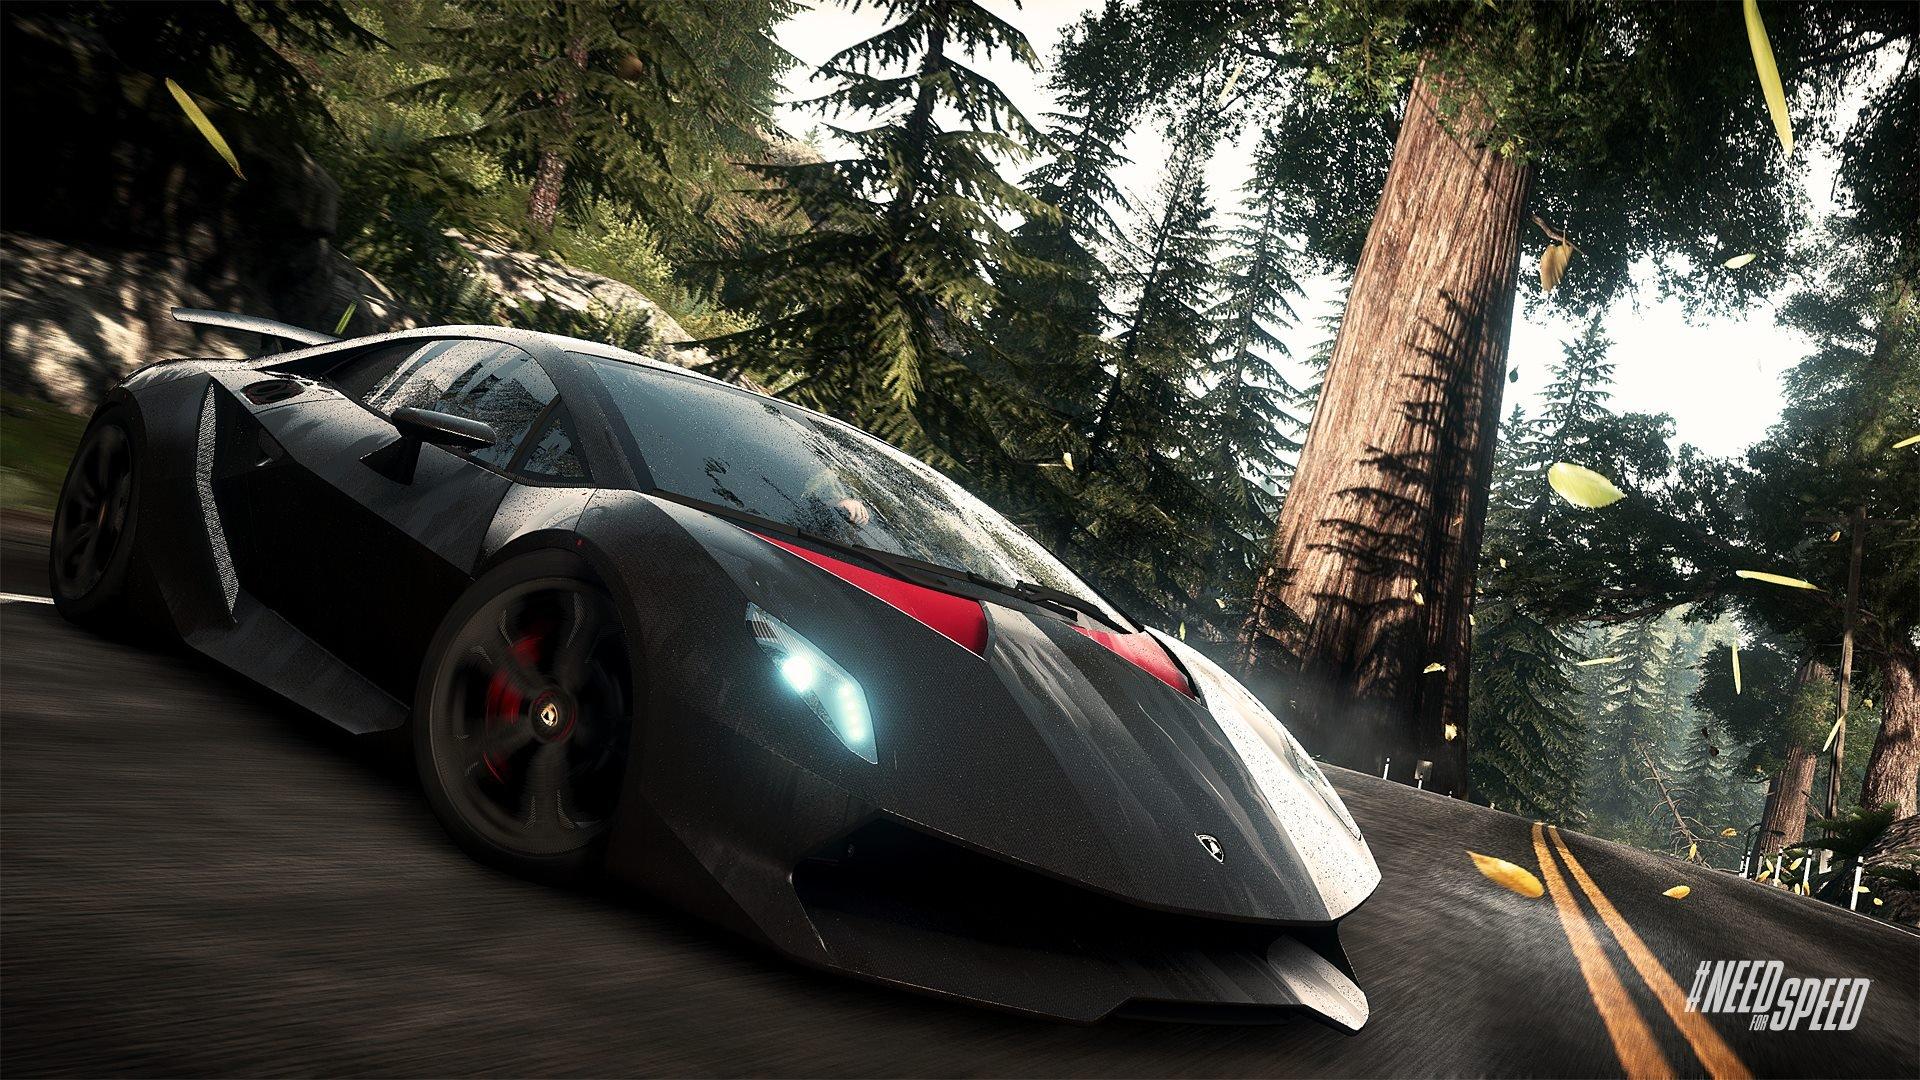 Lamborghini Sesto-Elemento - Need-for-Speed  Rivals wallpaper    Nfs Rivals Lamborghini